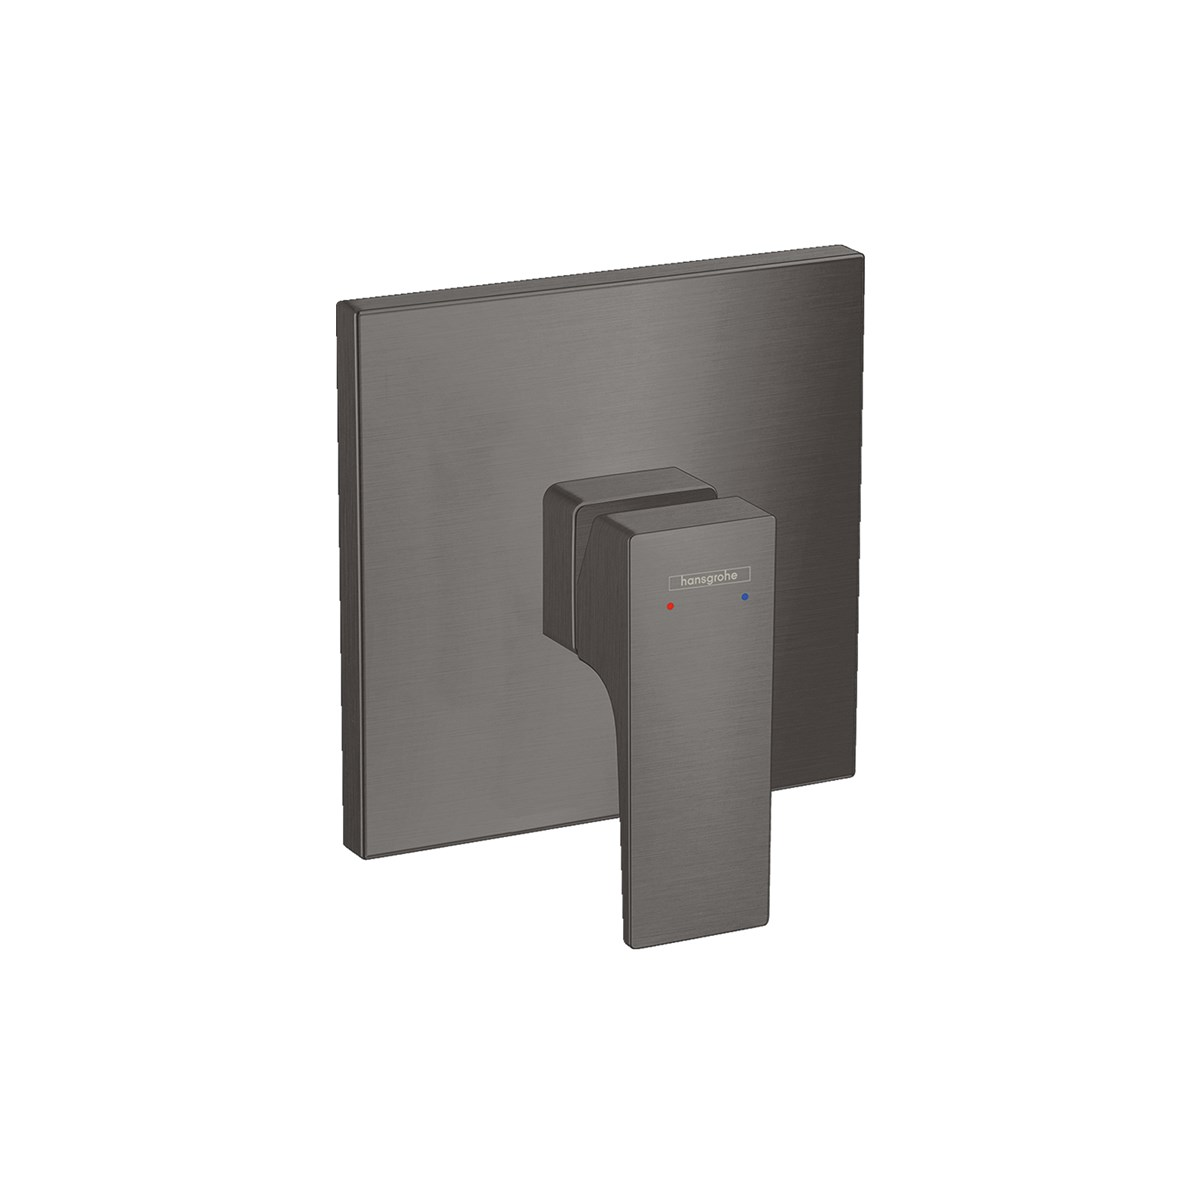 Hansgrohe-Metropol-Shower-Mixer-Concealed-32565000-Matisse-1